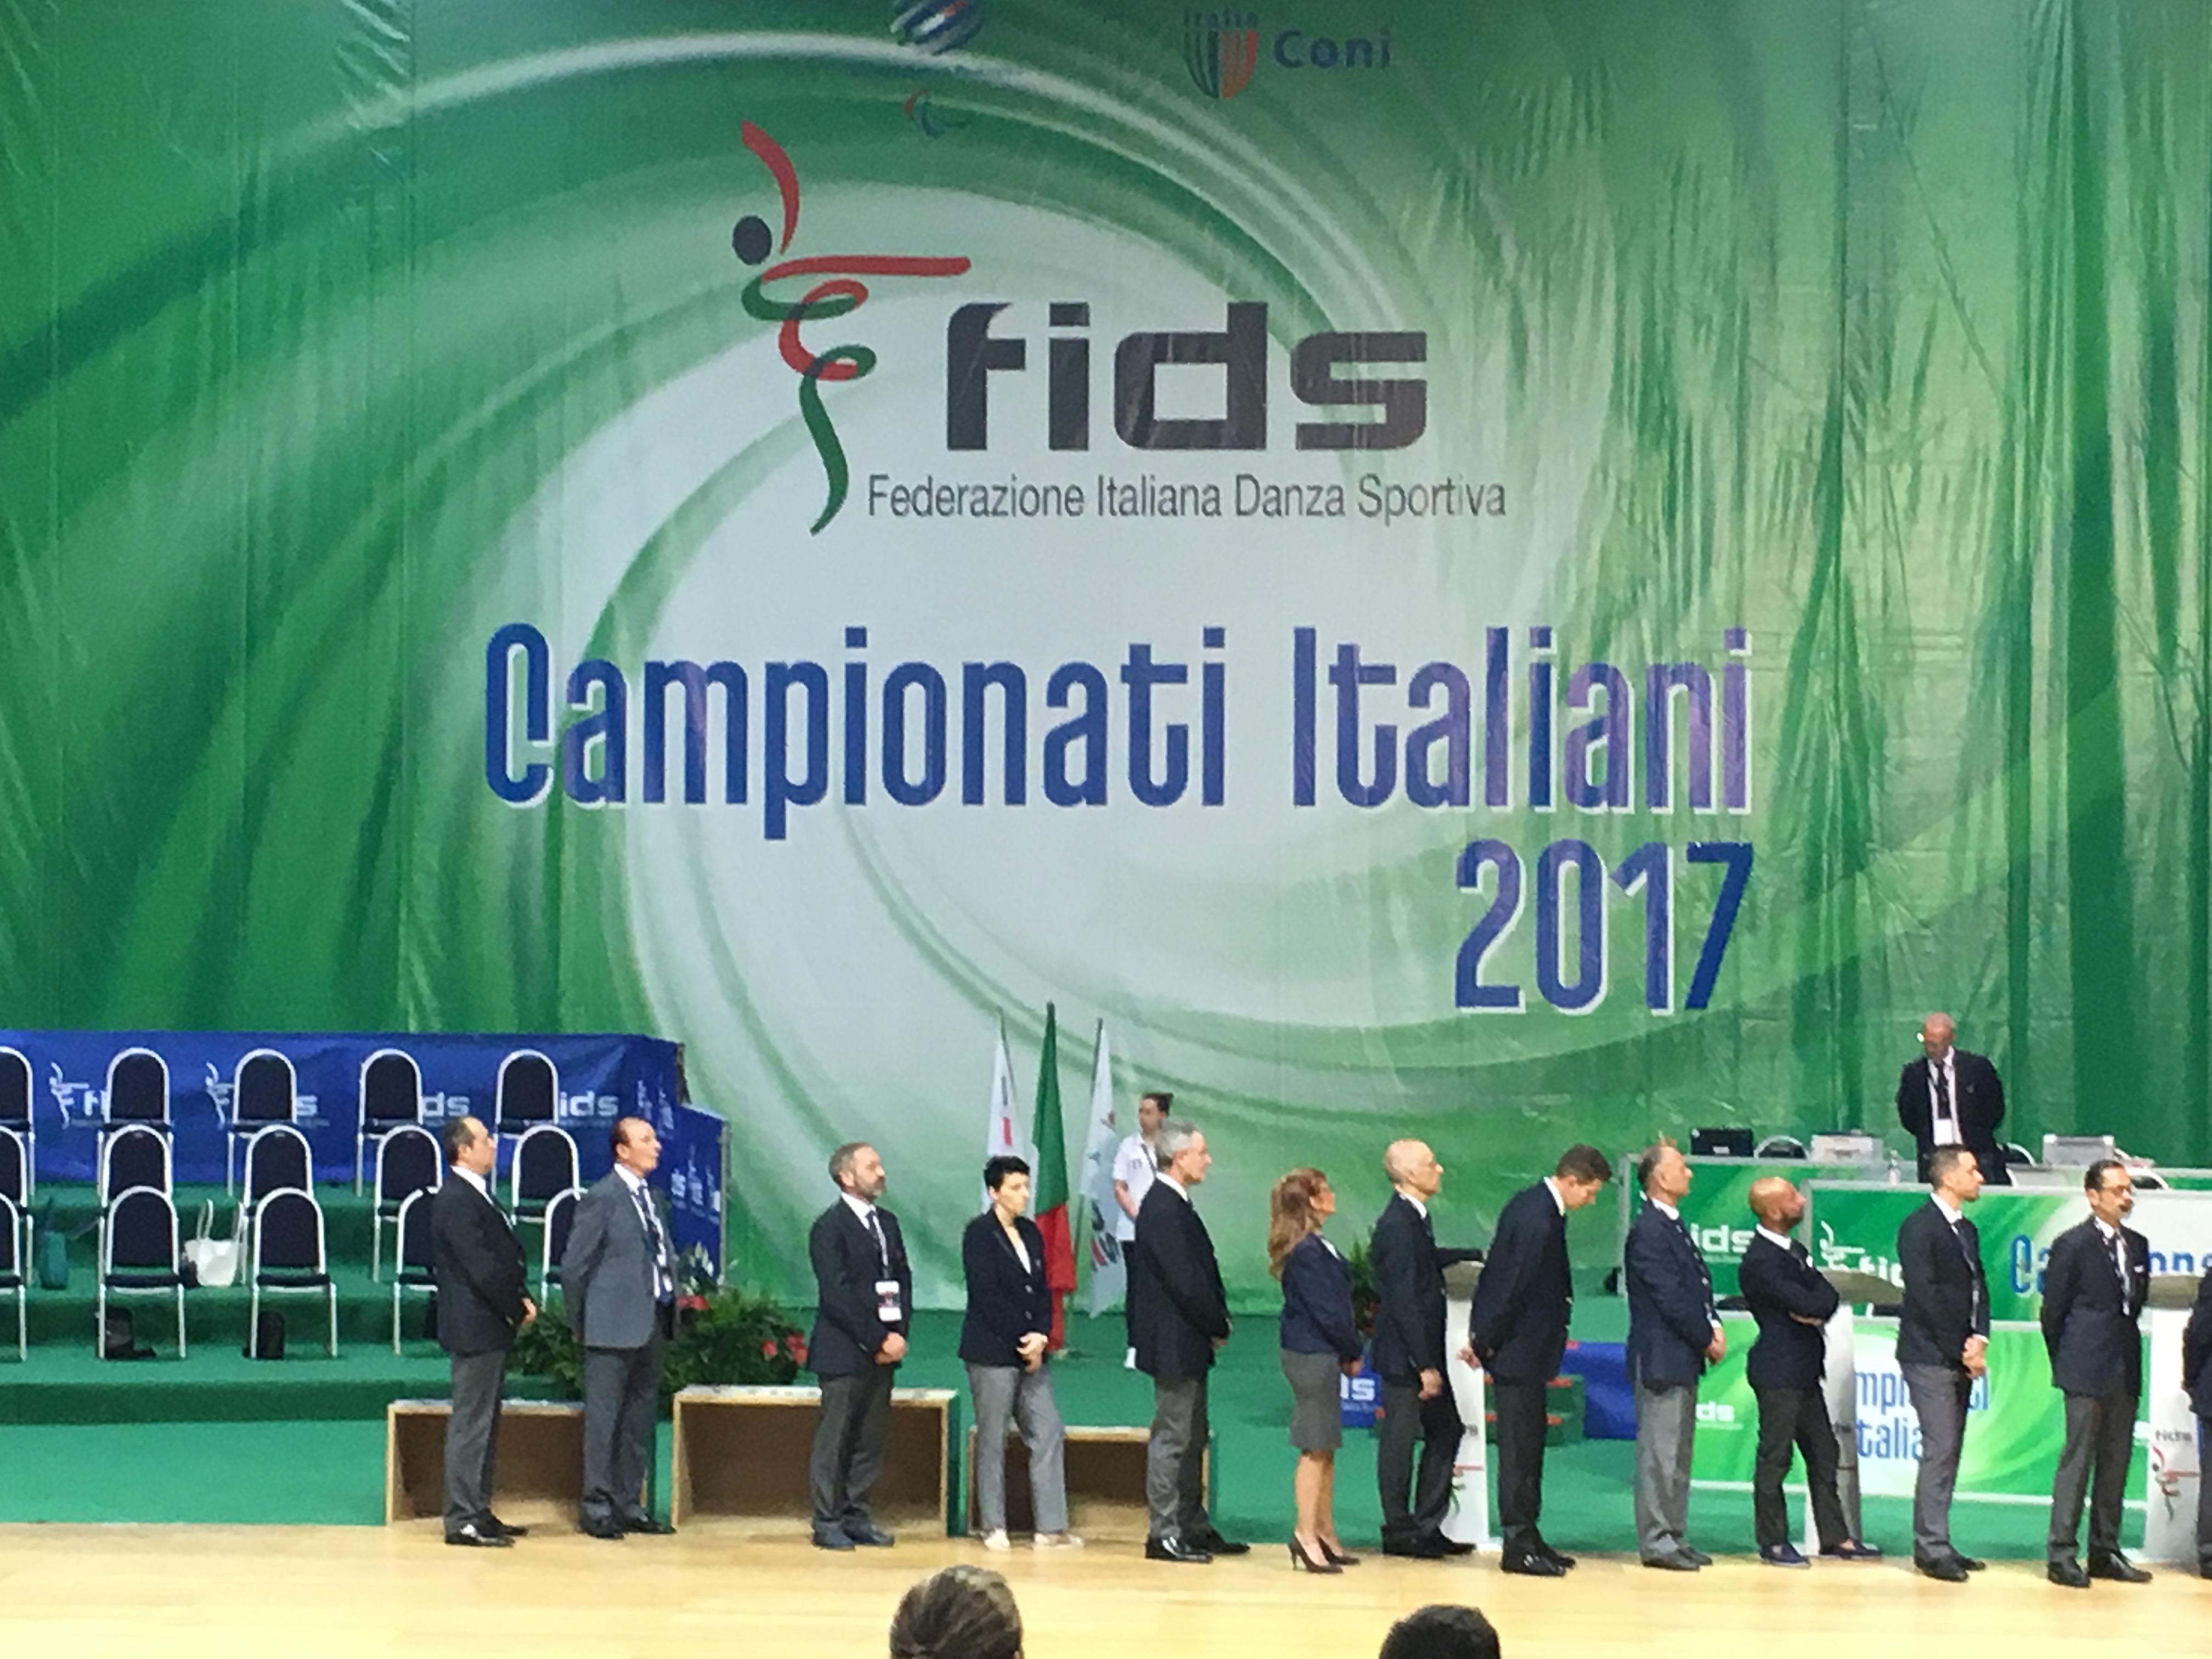 Rimini 2017 Campionati Italiani Farina Angelo Iacovissi Donatella